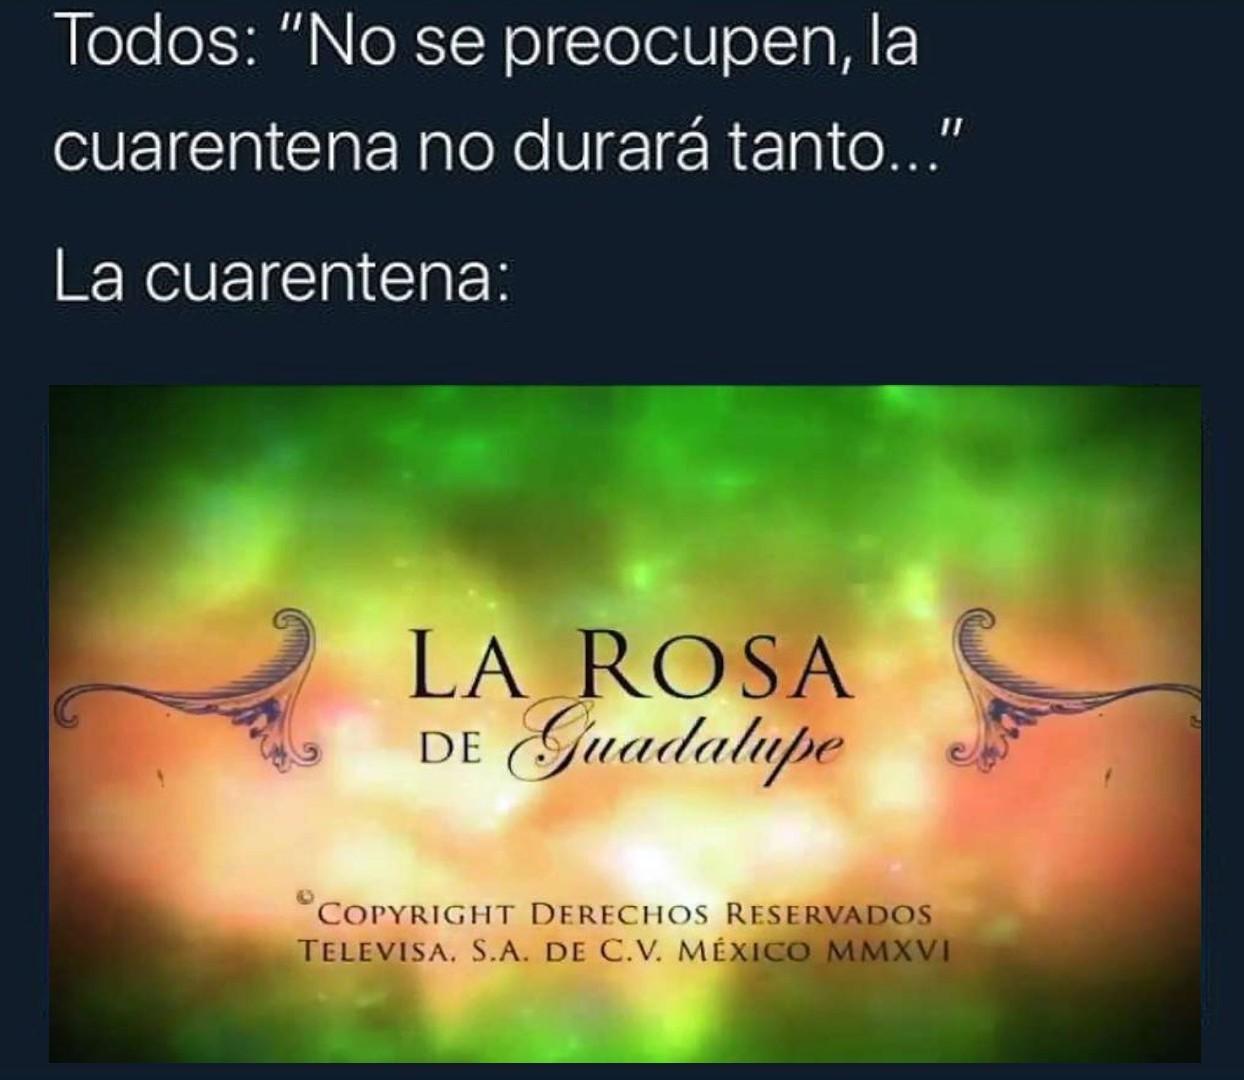 rosa - meme